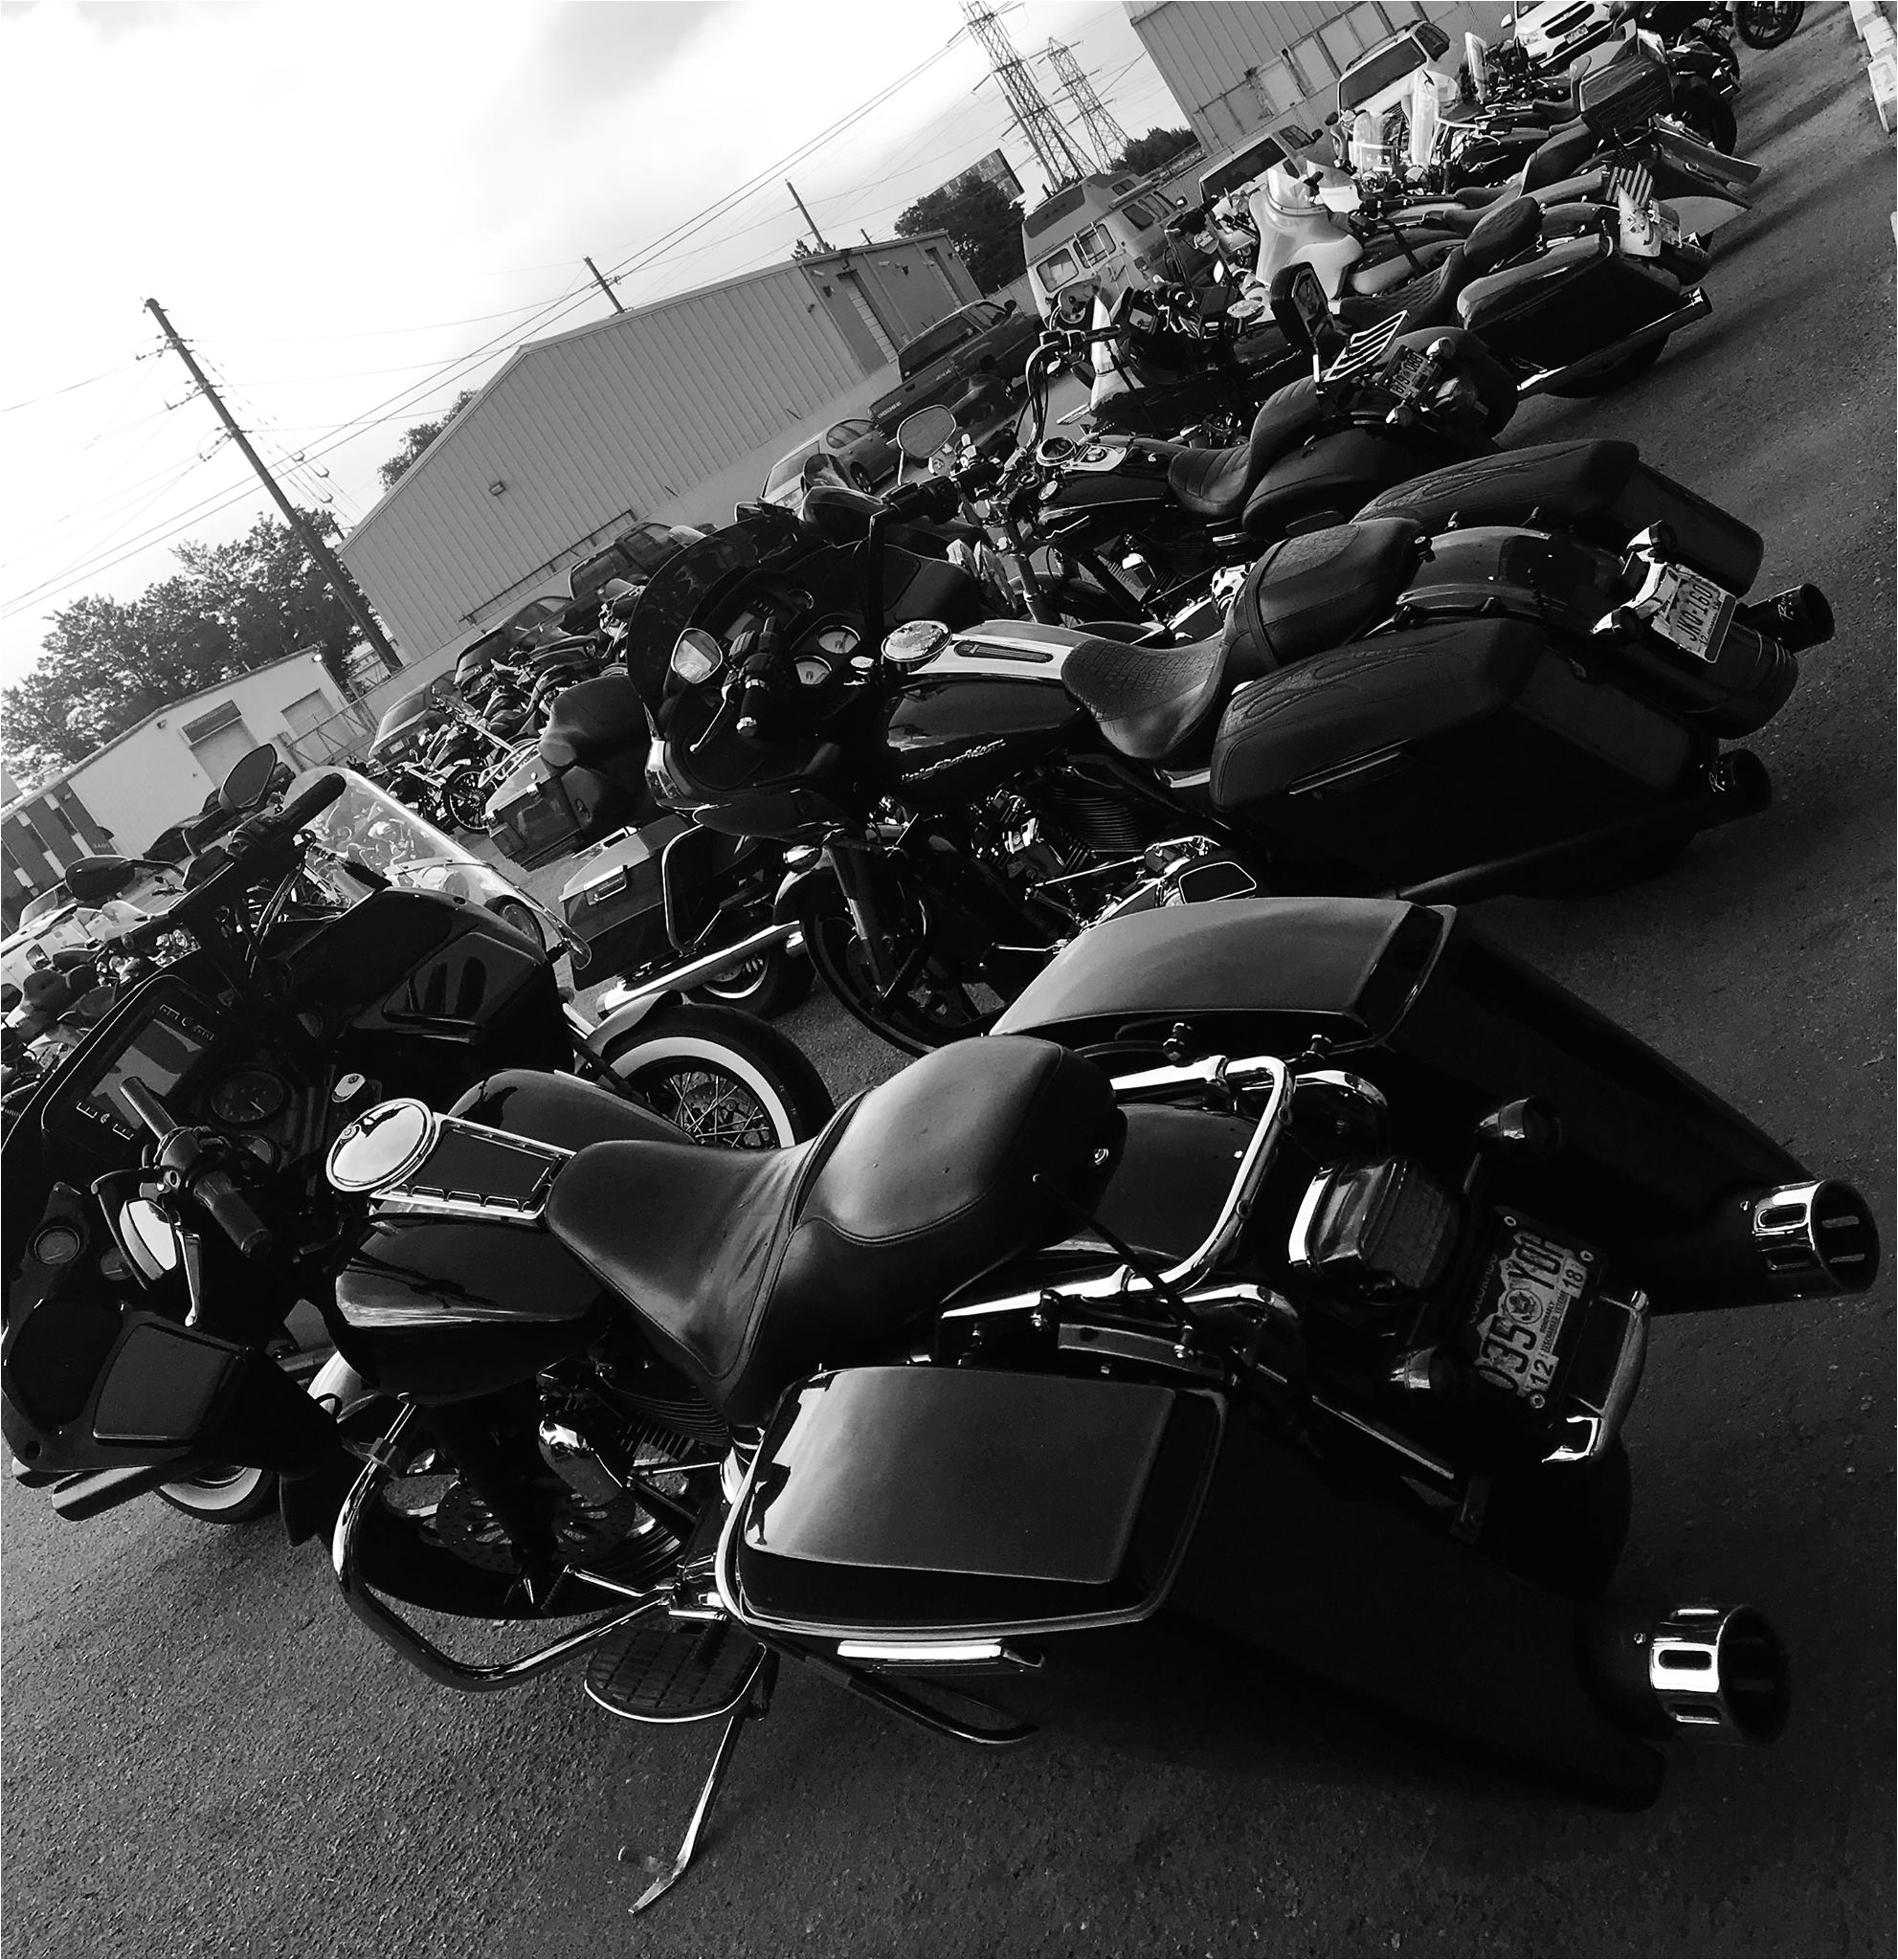 thursday bike nights at wheelz bar grill wheelz bar grill denver from 28 june